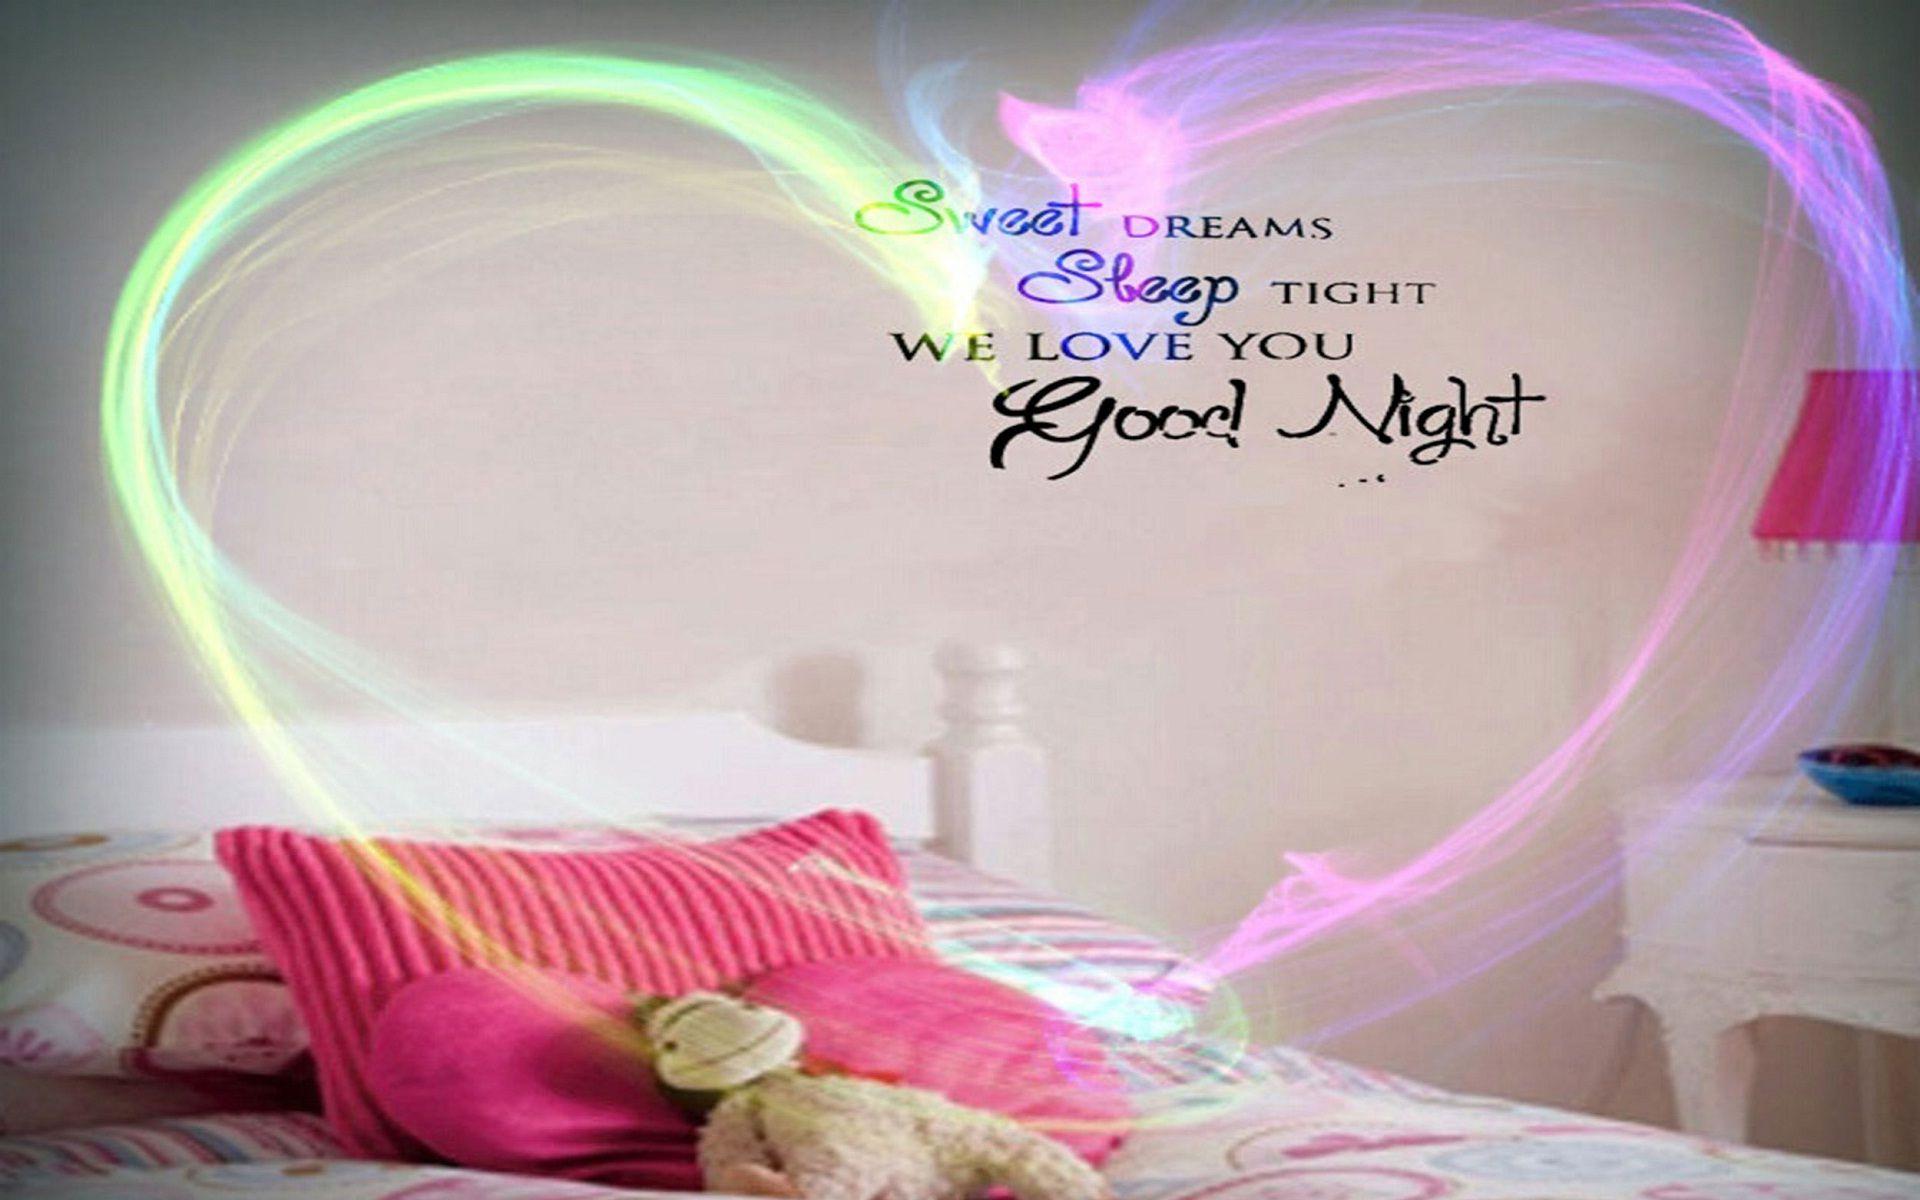 Good Night Love You Hearts Bedroom Wallpapers - Good Night I Love You - HD Wallpaper